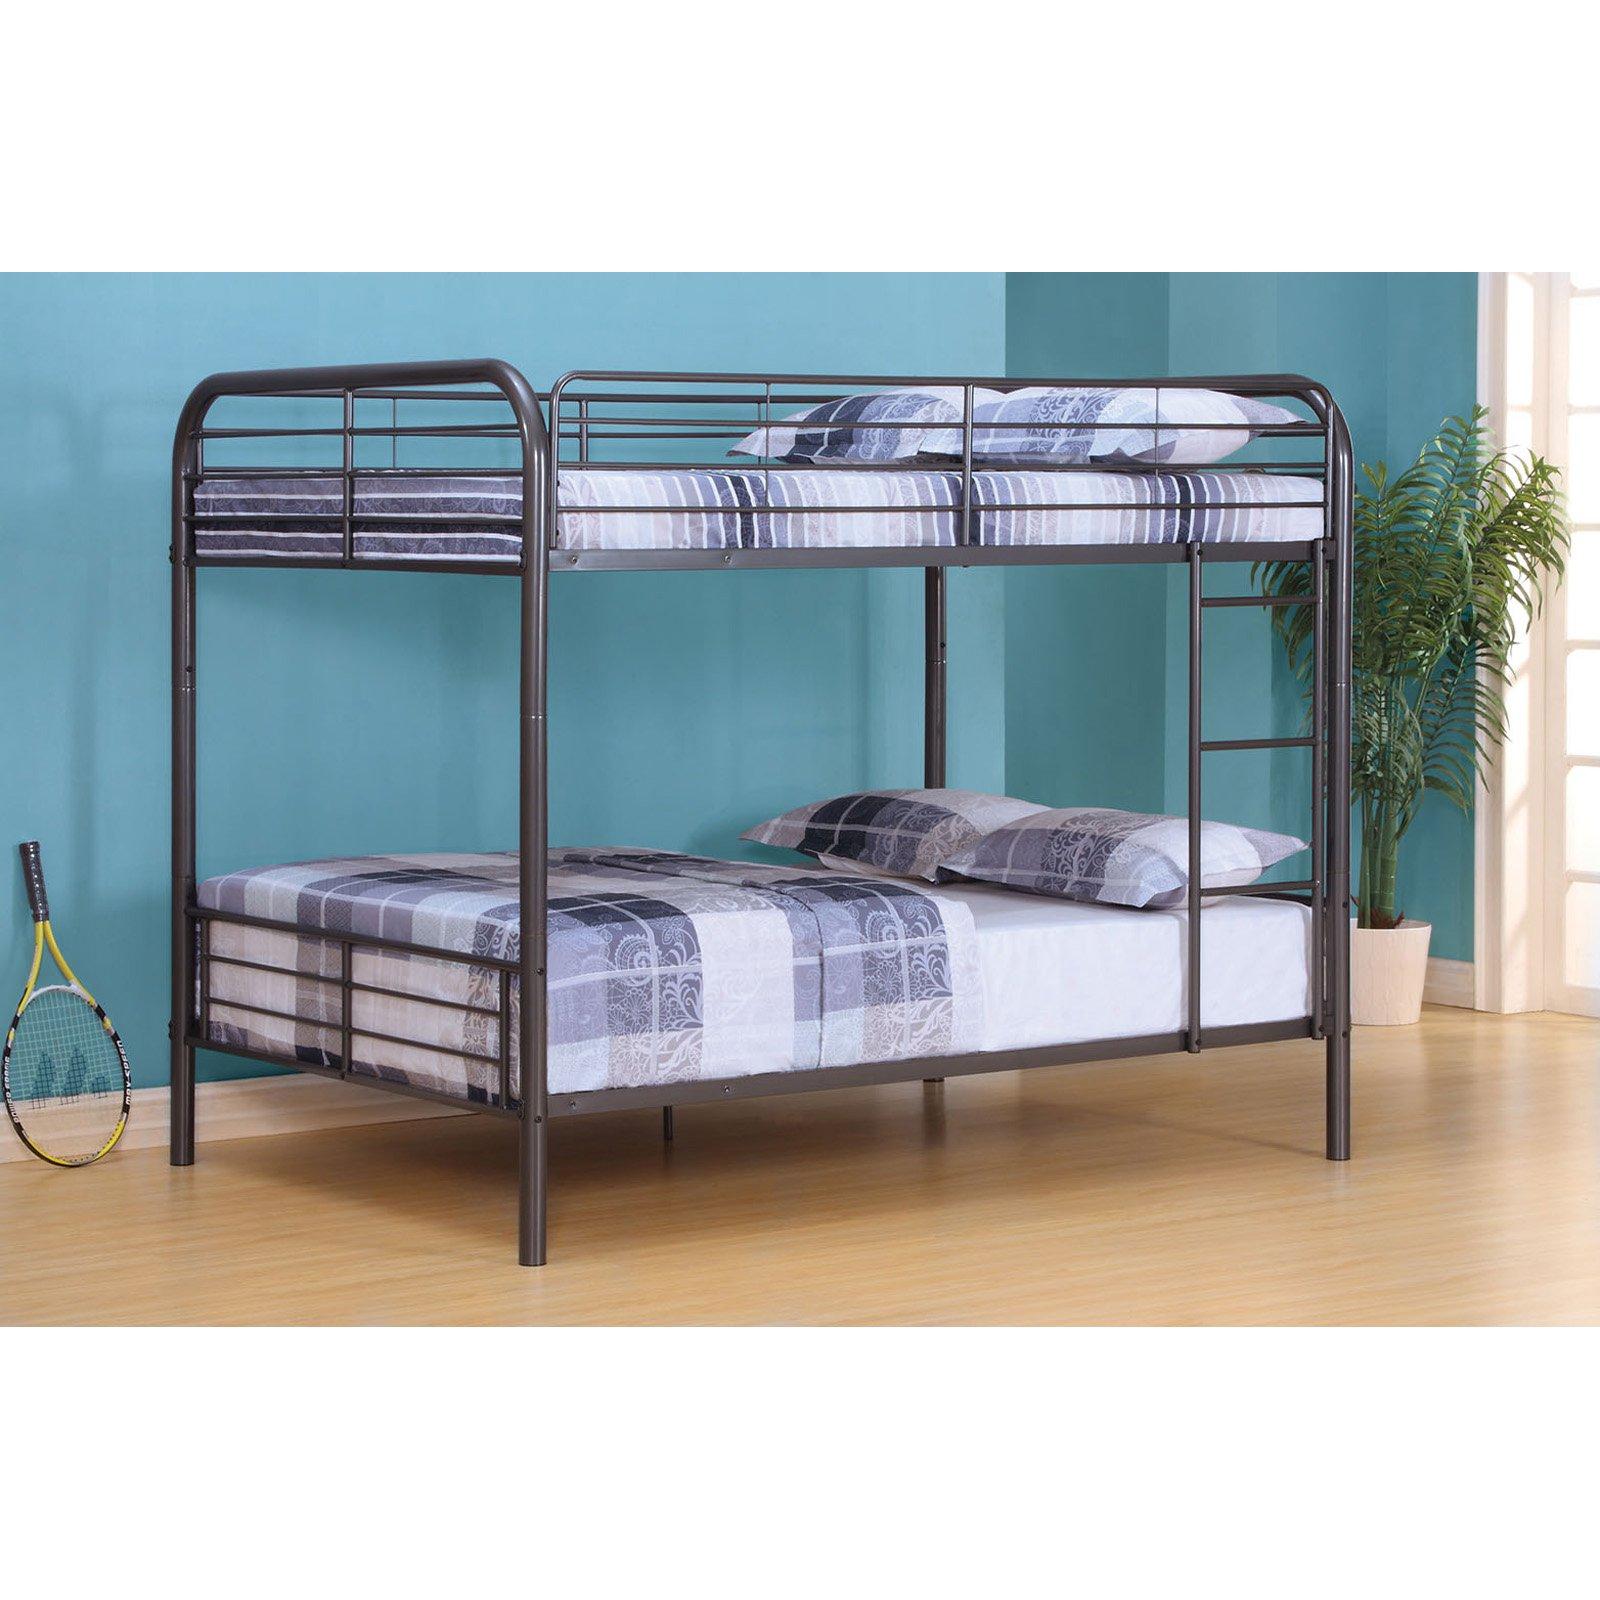 Bristol Full/Full Bunk Bed, Gunmetal, Box 2 of 2